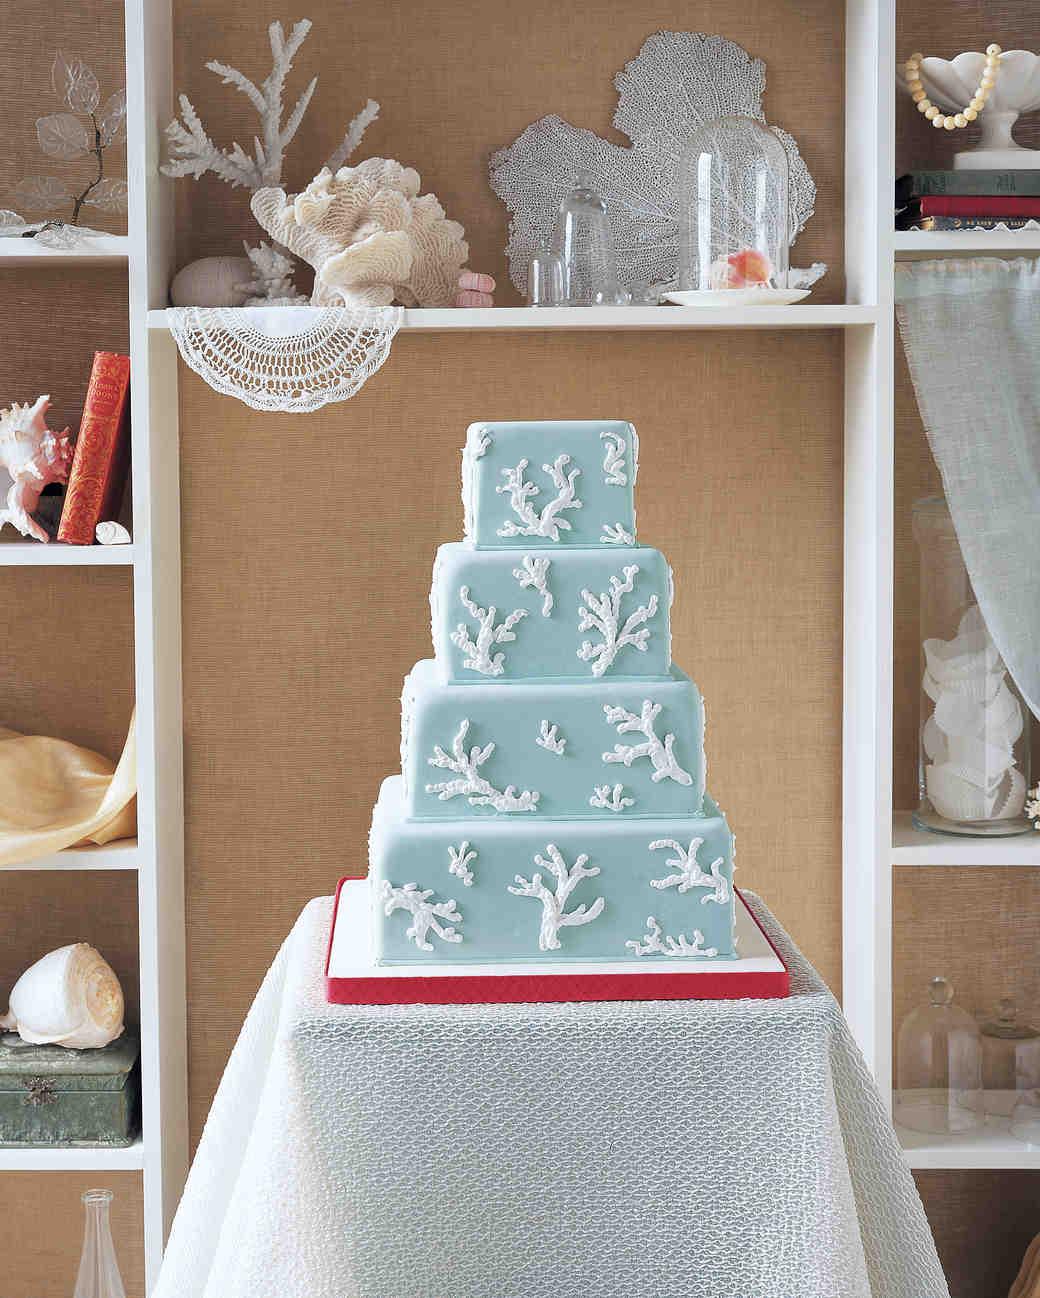 Small Beach Wedding Ideas: 25 Amazing Beach Wedding Cakes